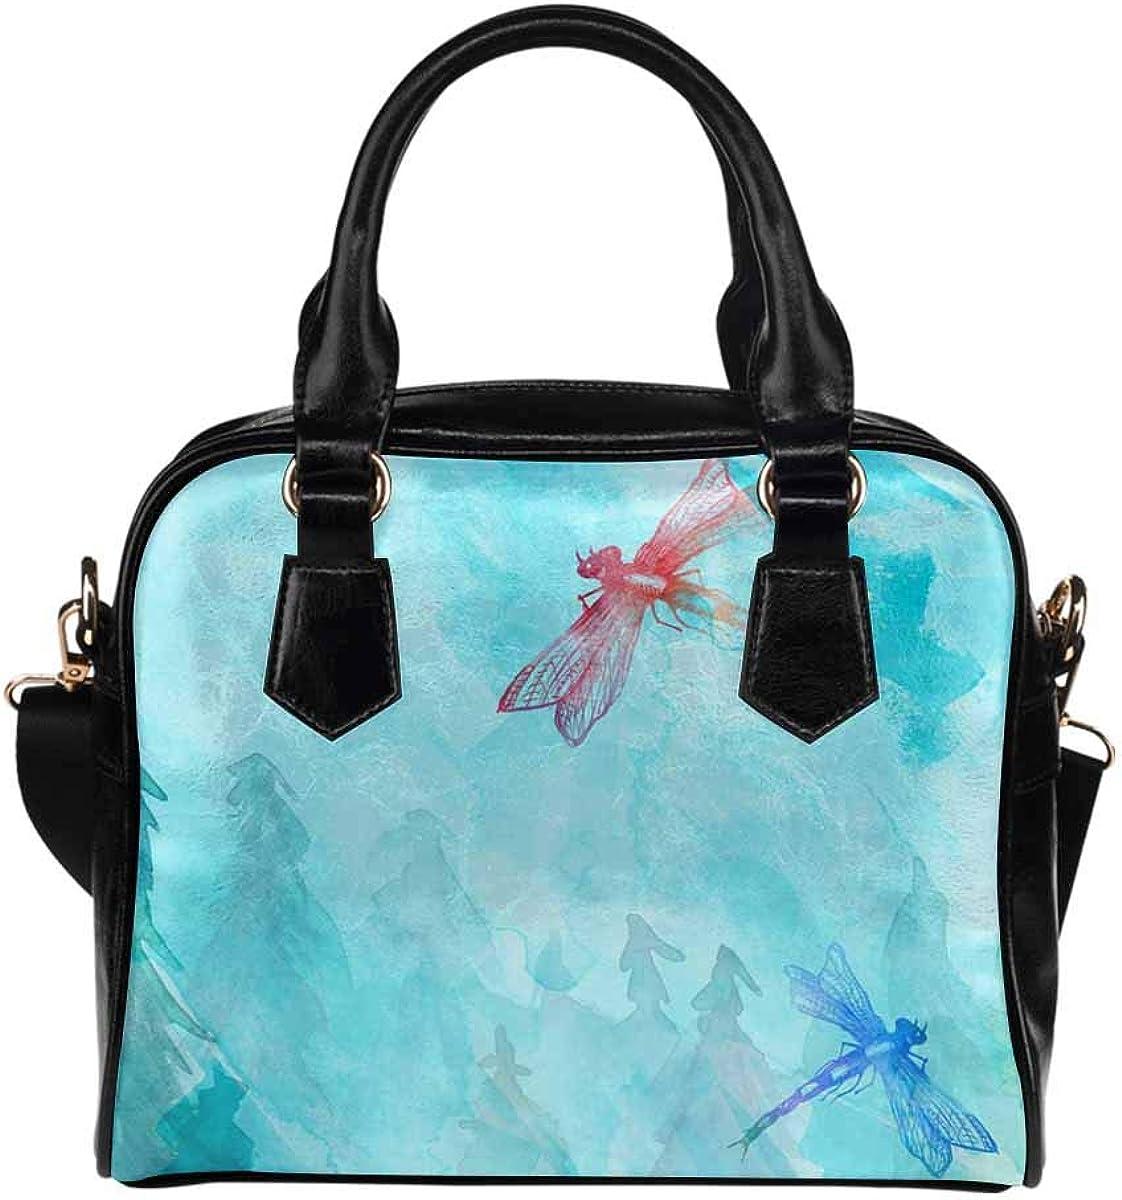 Watercolor Dragonfly PU Leather Purse Handbags Shoulder Crossbody Bag for Women Girls